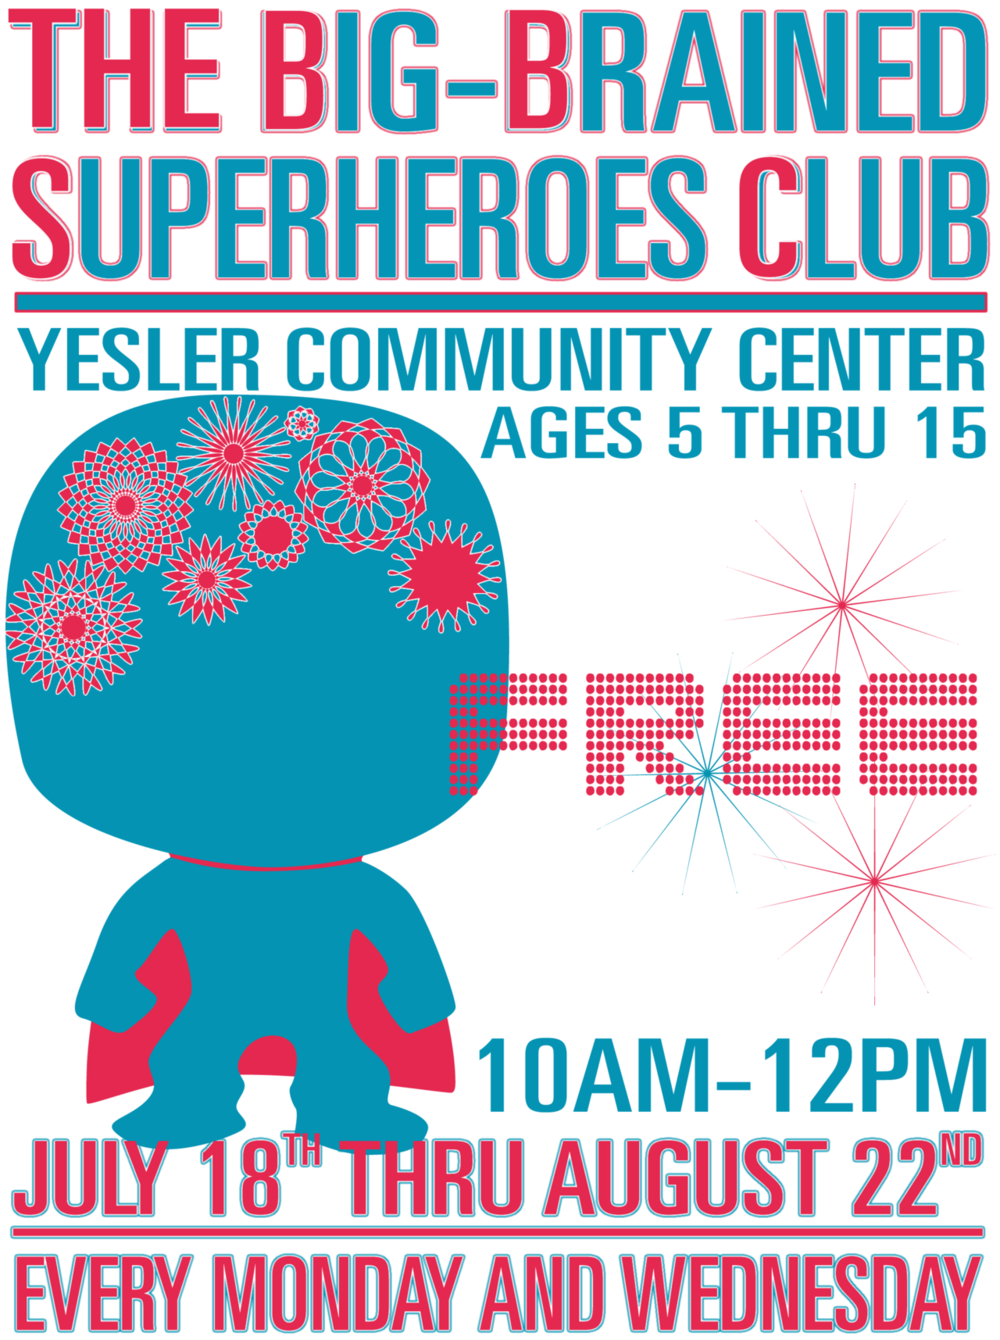 The Big-Brained Superheroes Club flier